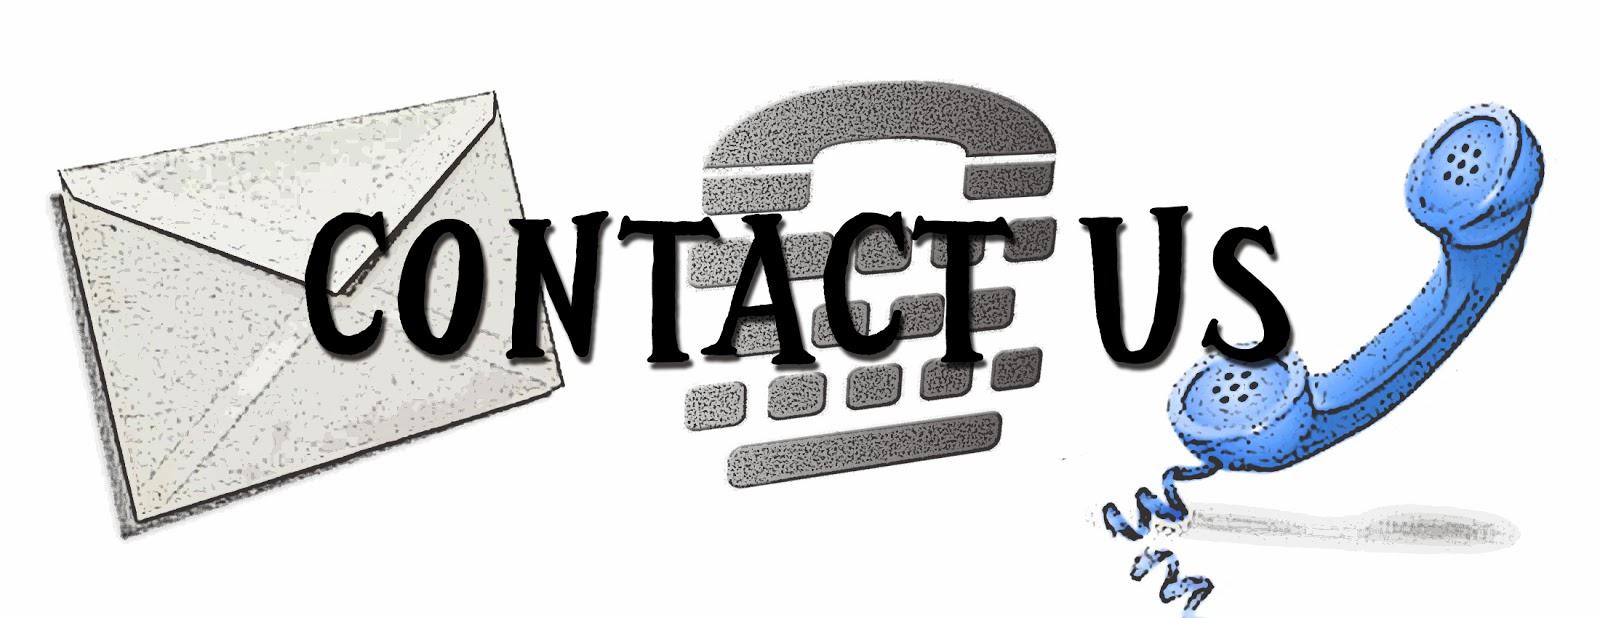 Contact-inforisticblog